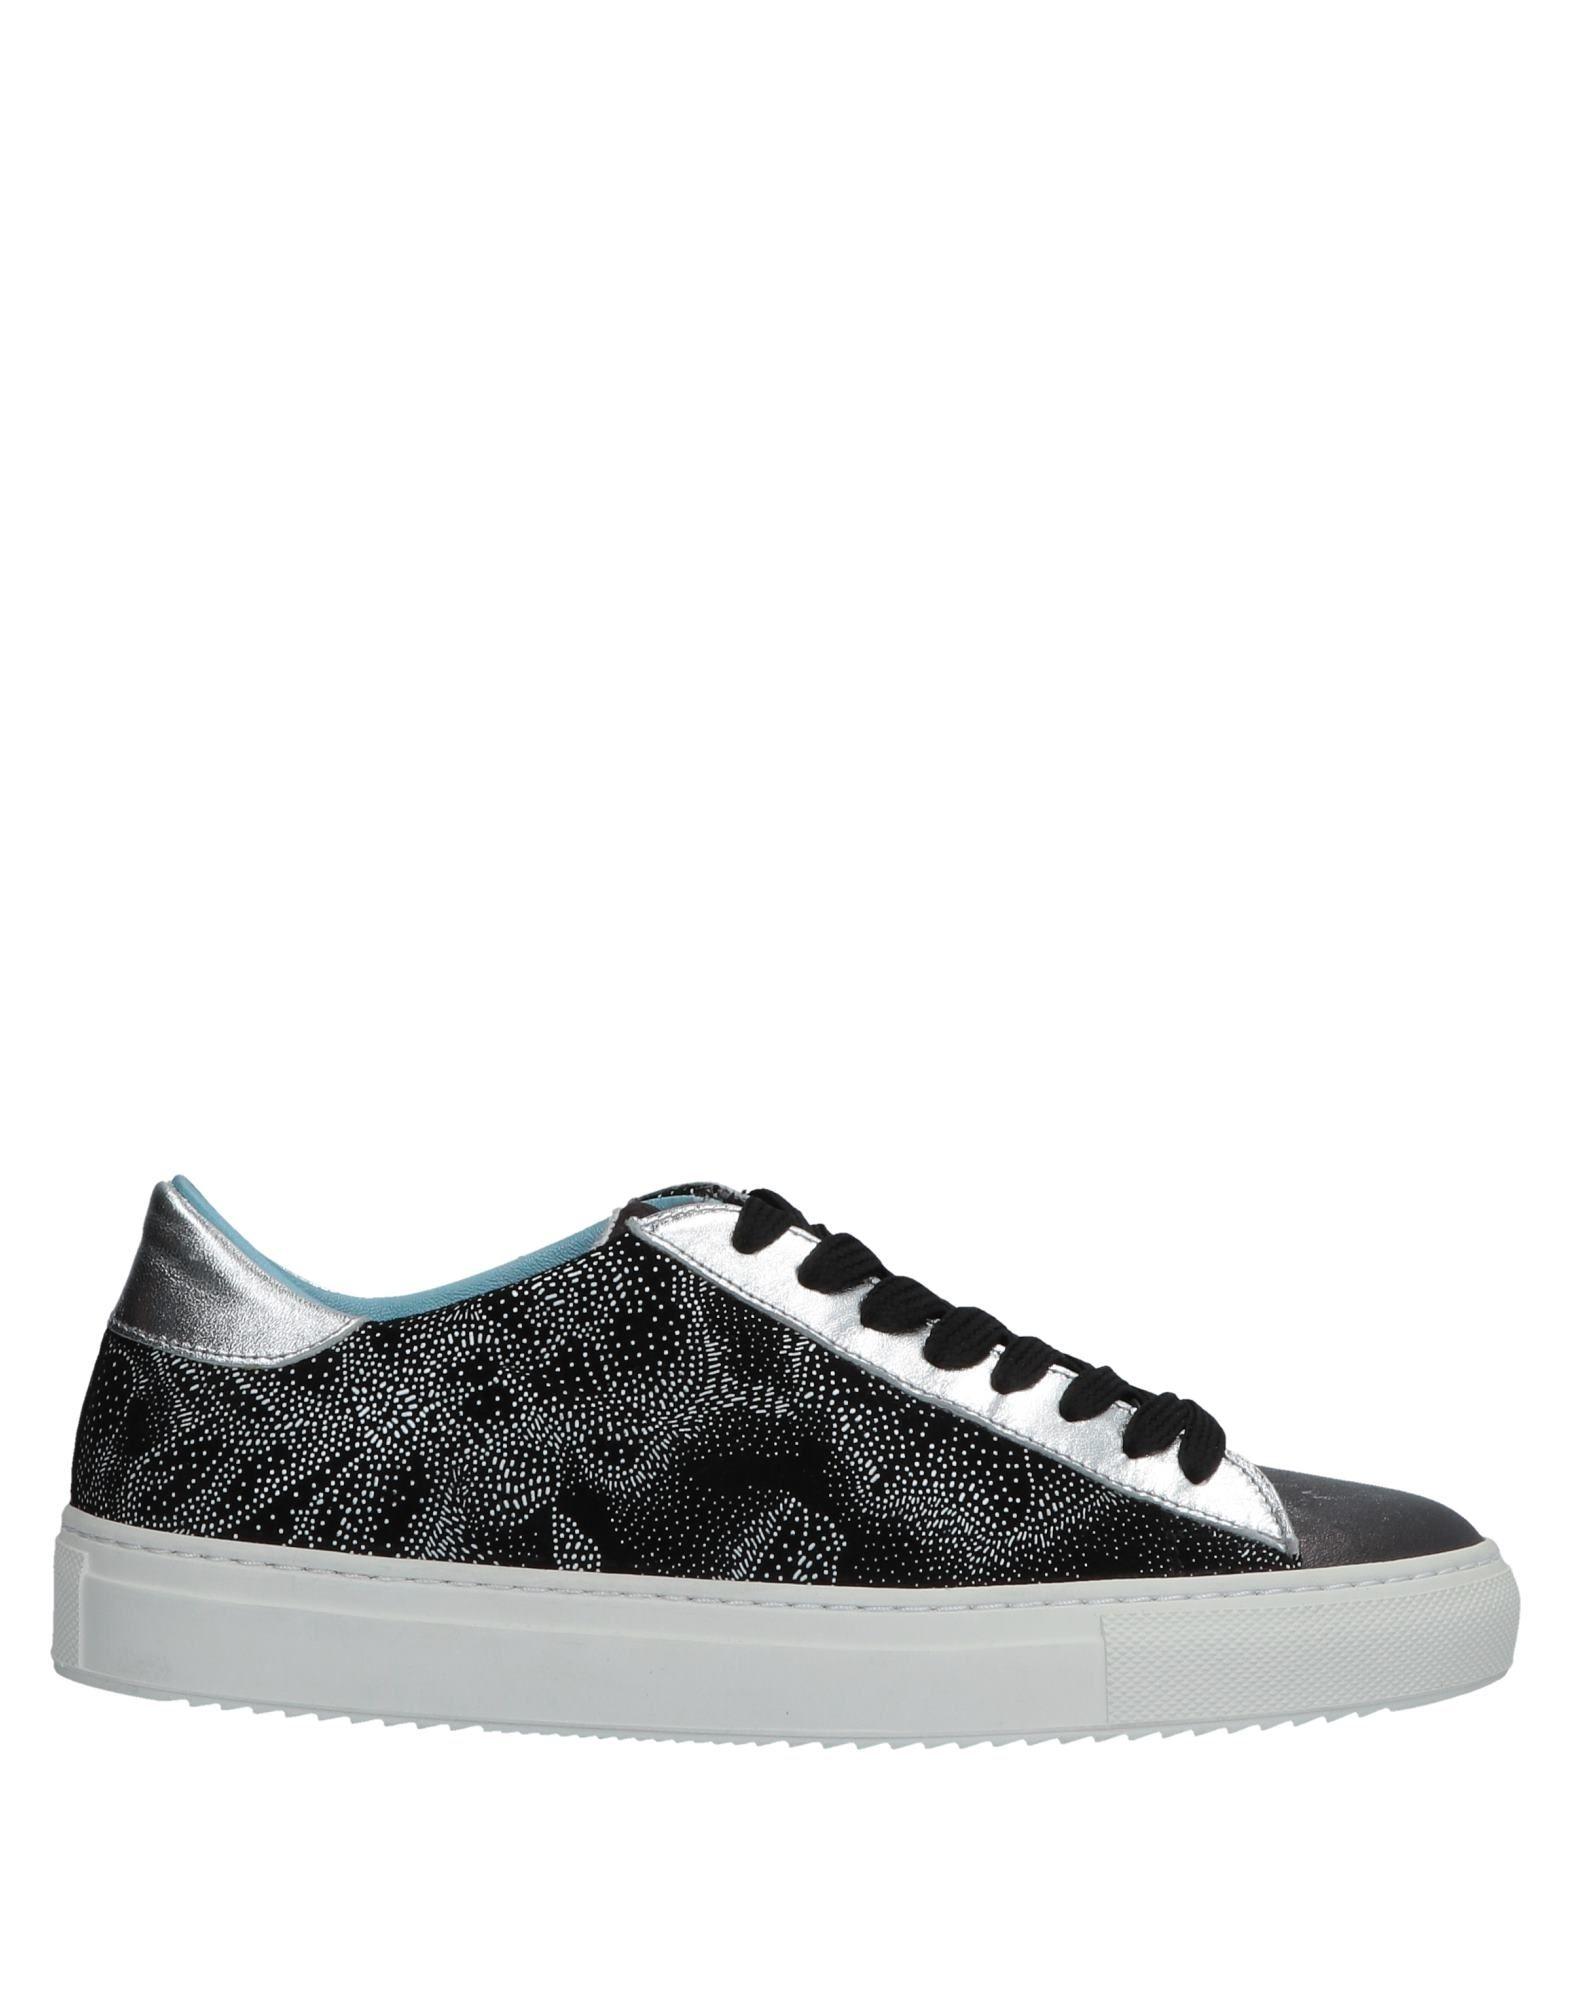 Quattrobarradodici Sneakers - Women Quattrobarradodici Sneakers online on 11573351QB  United Kingdom - 11573351QB on 6df2b4